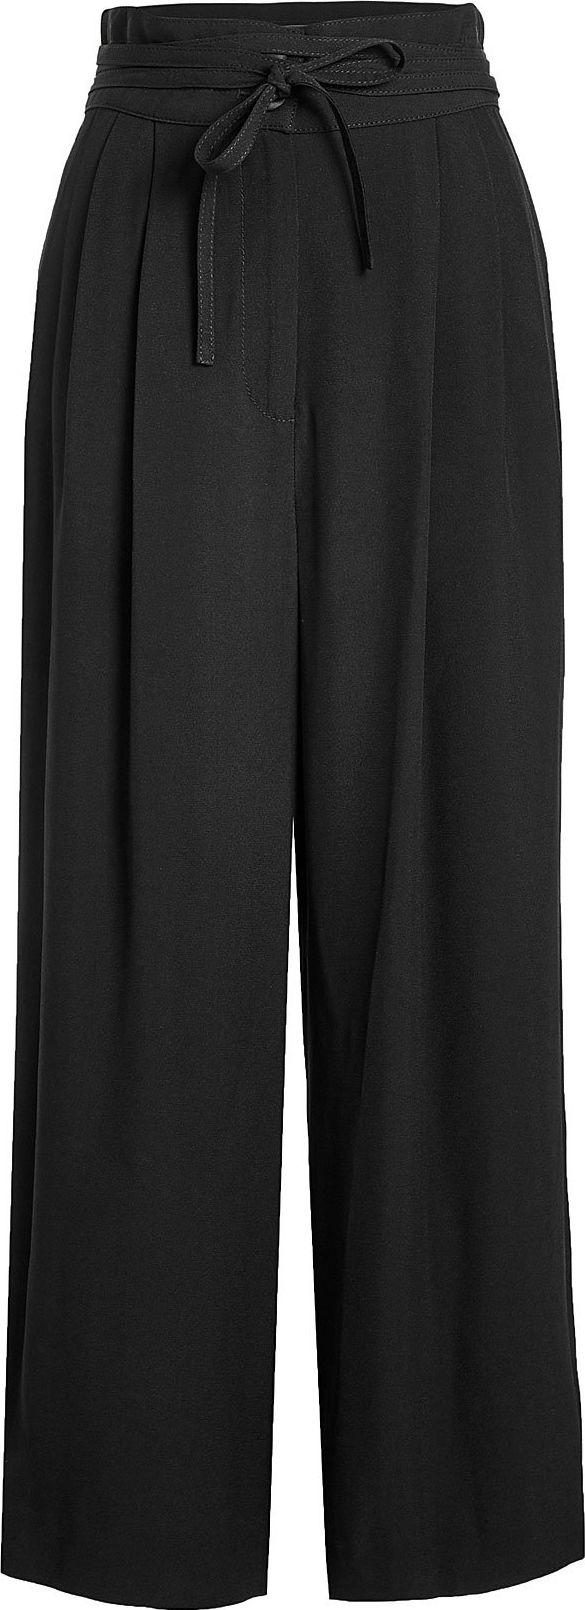 MARC JACOBS - Wide Leg Cropped Pants